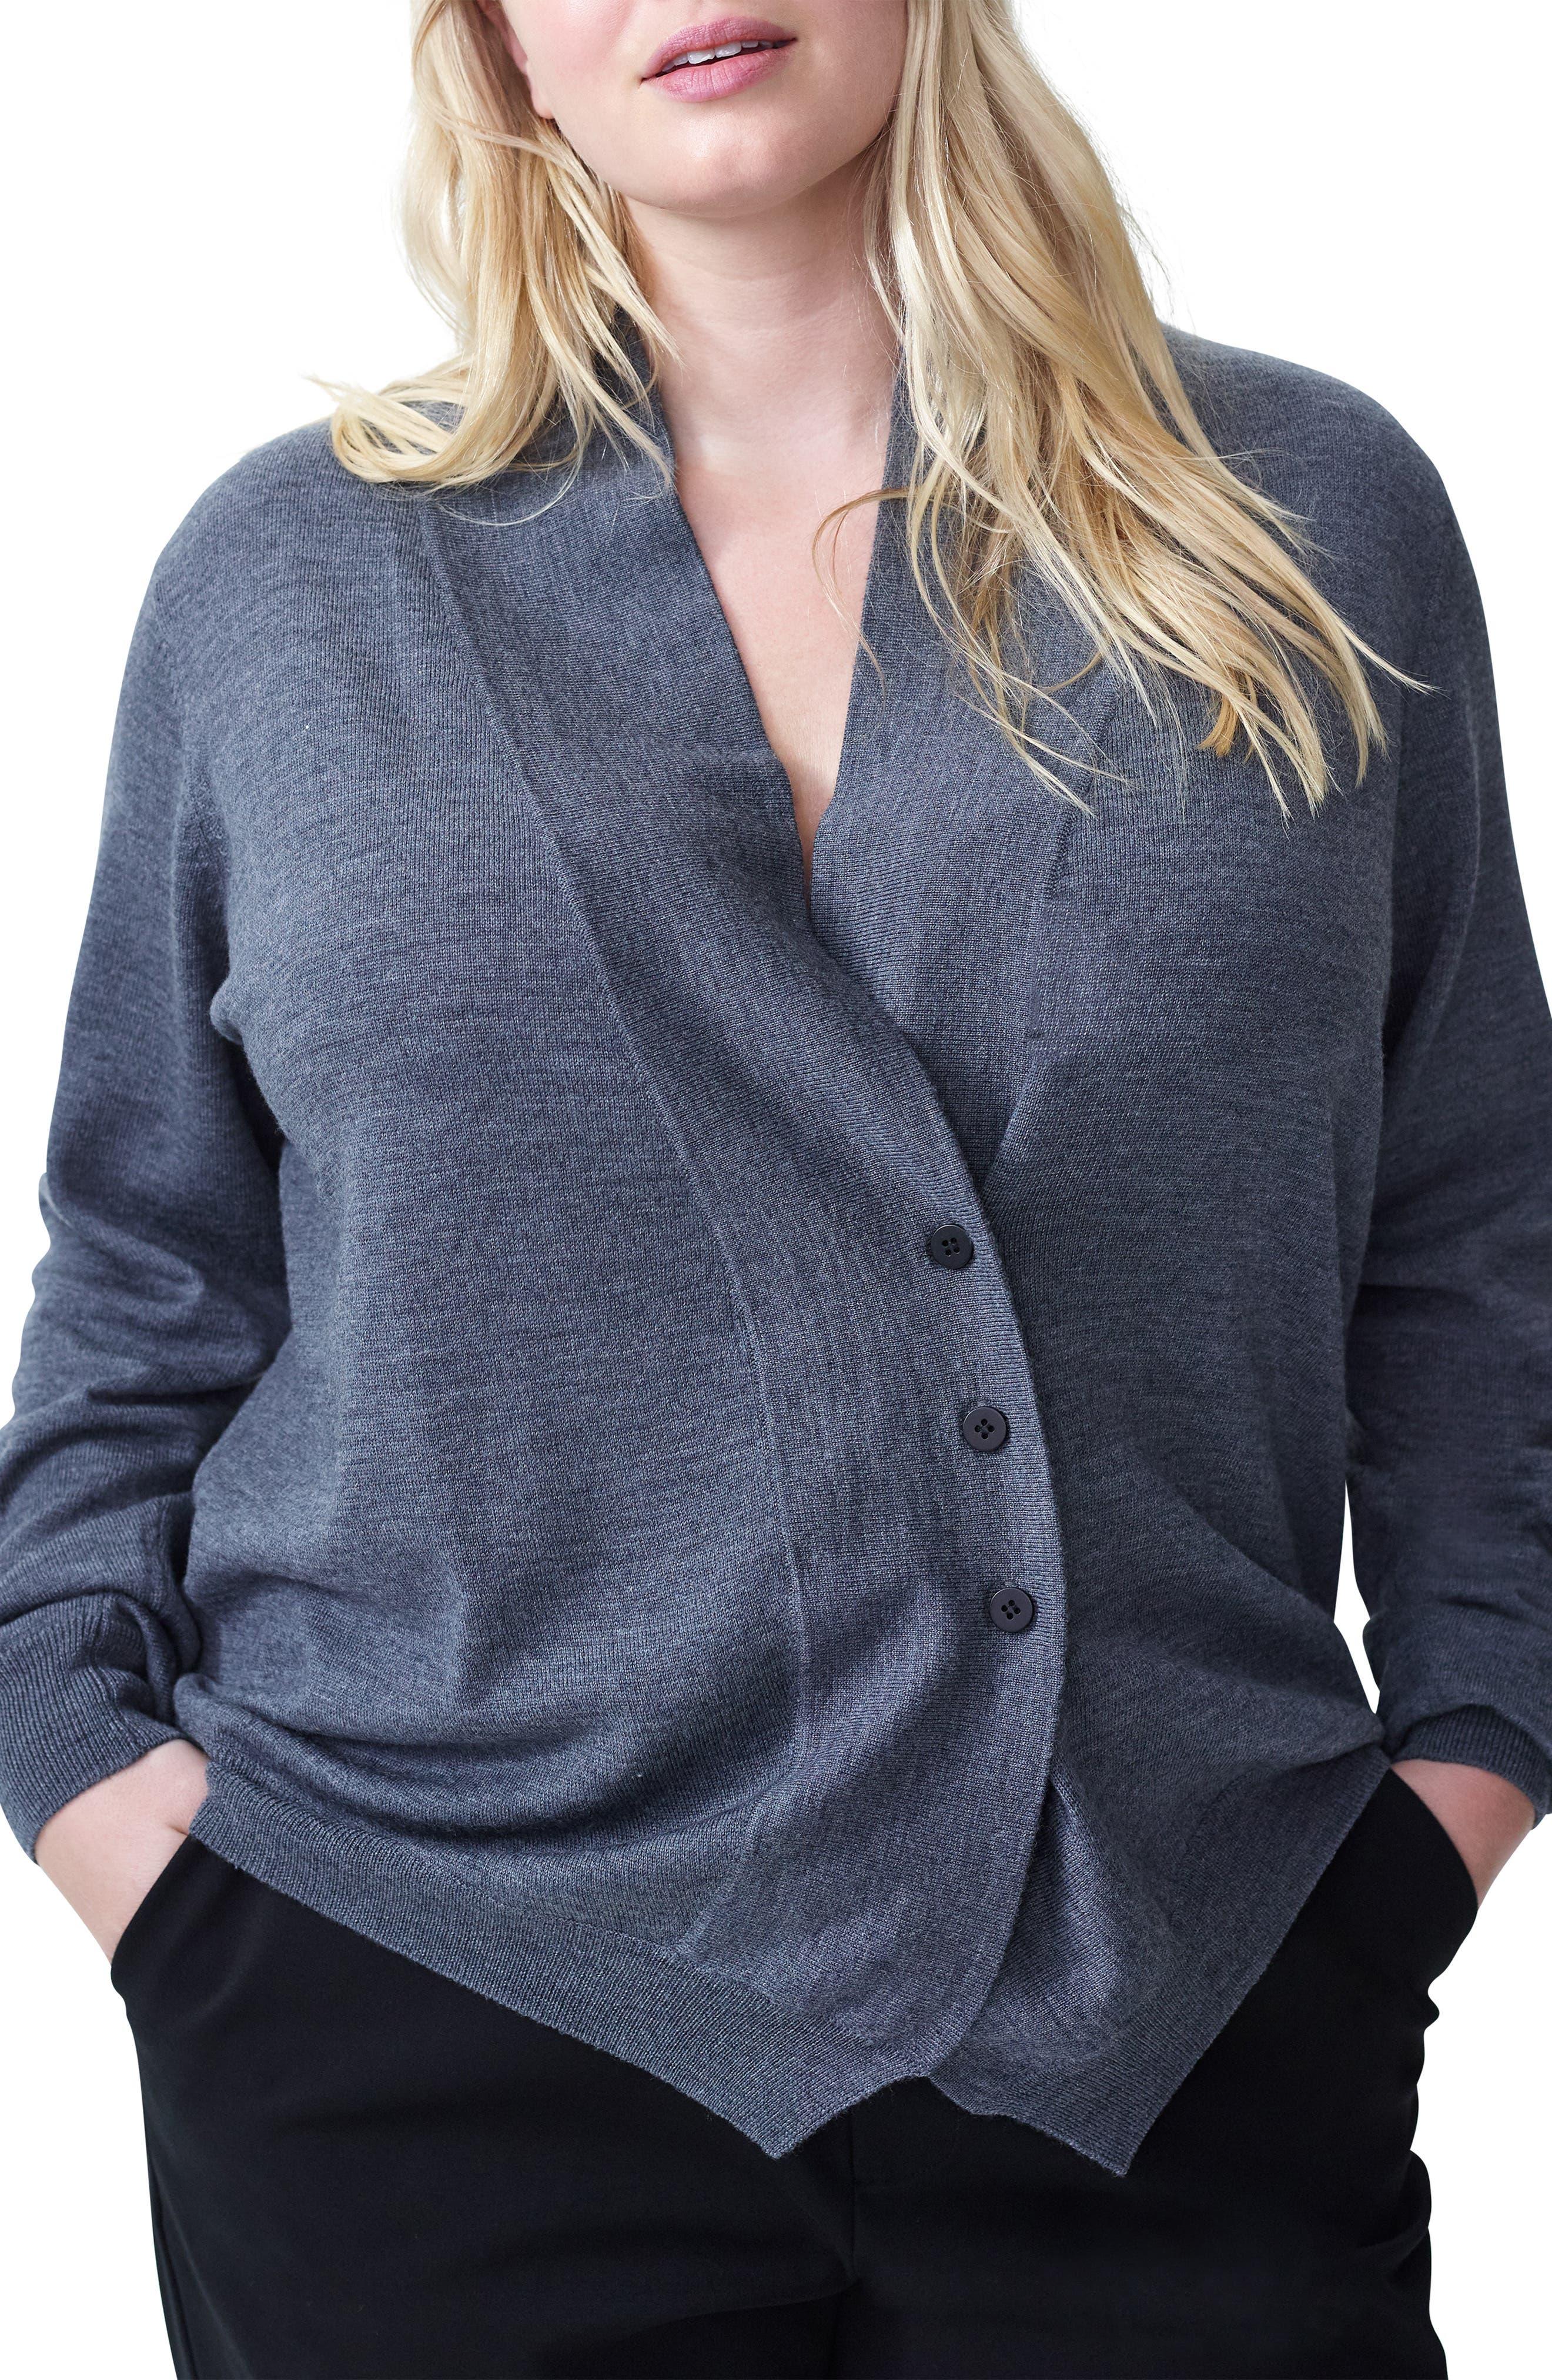 Plus Size Universal Standard Curved Merino Wool Cardigan, Grey